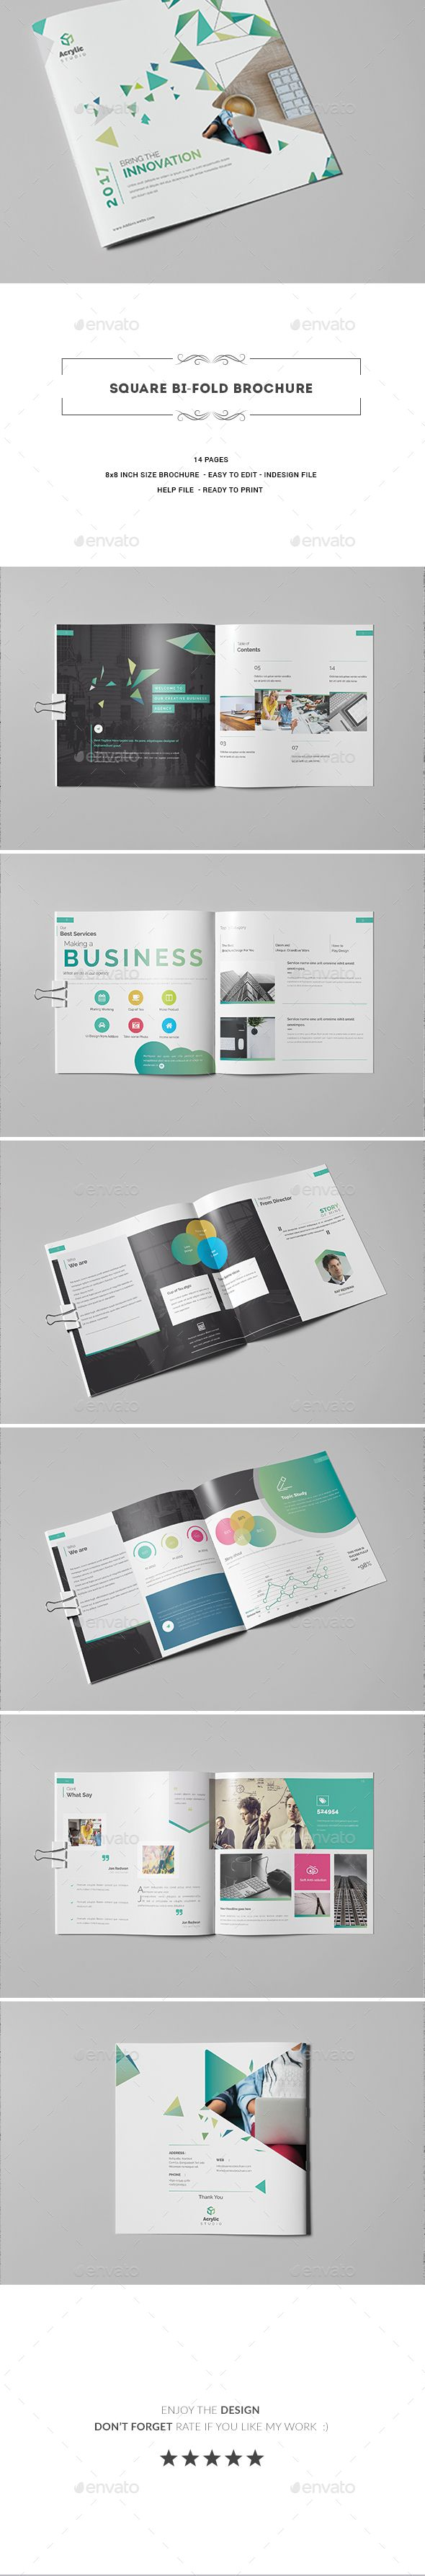 Square Bi fold Brochure - Corporate #Brochures Download here: https://graphicriver.net/item/square-bi-fold-brochure/20295797?ref=alena994